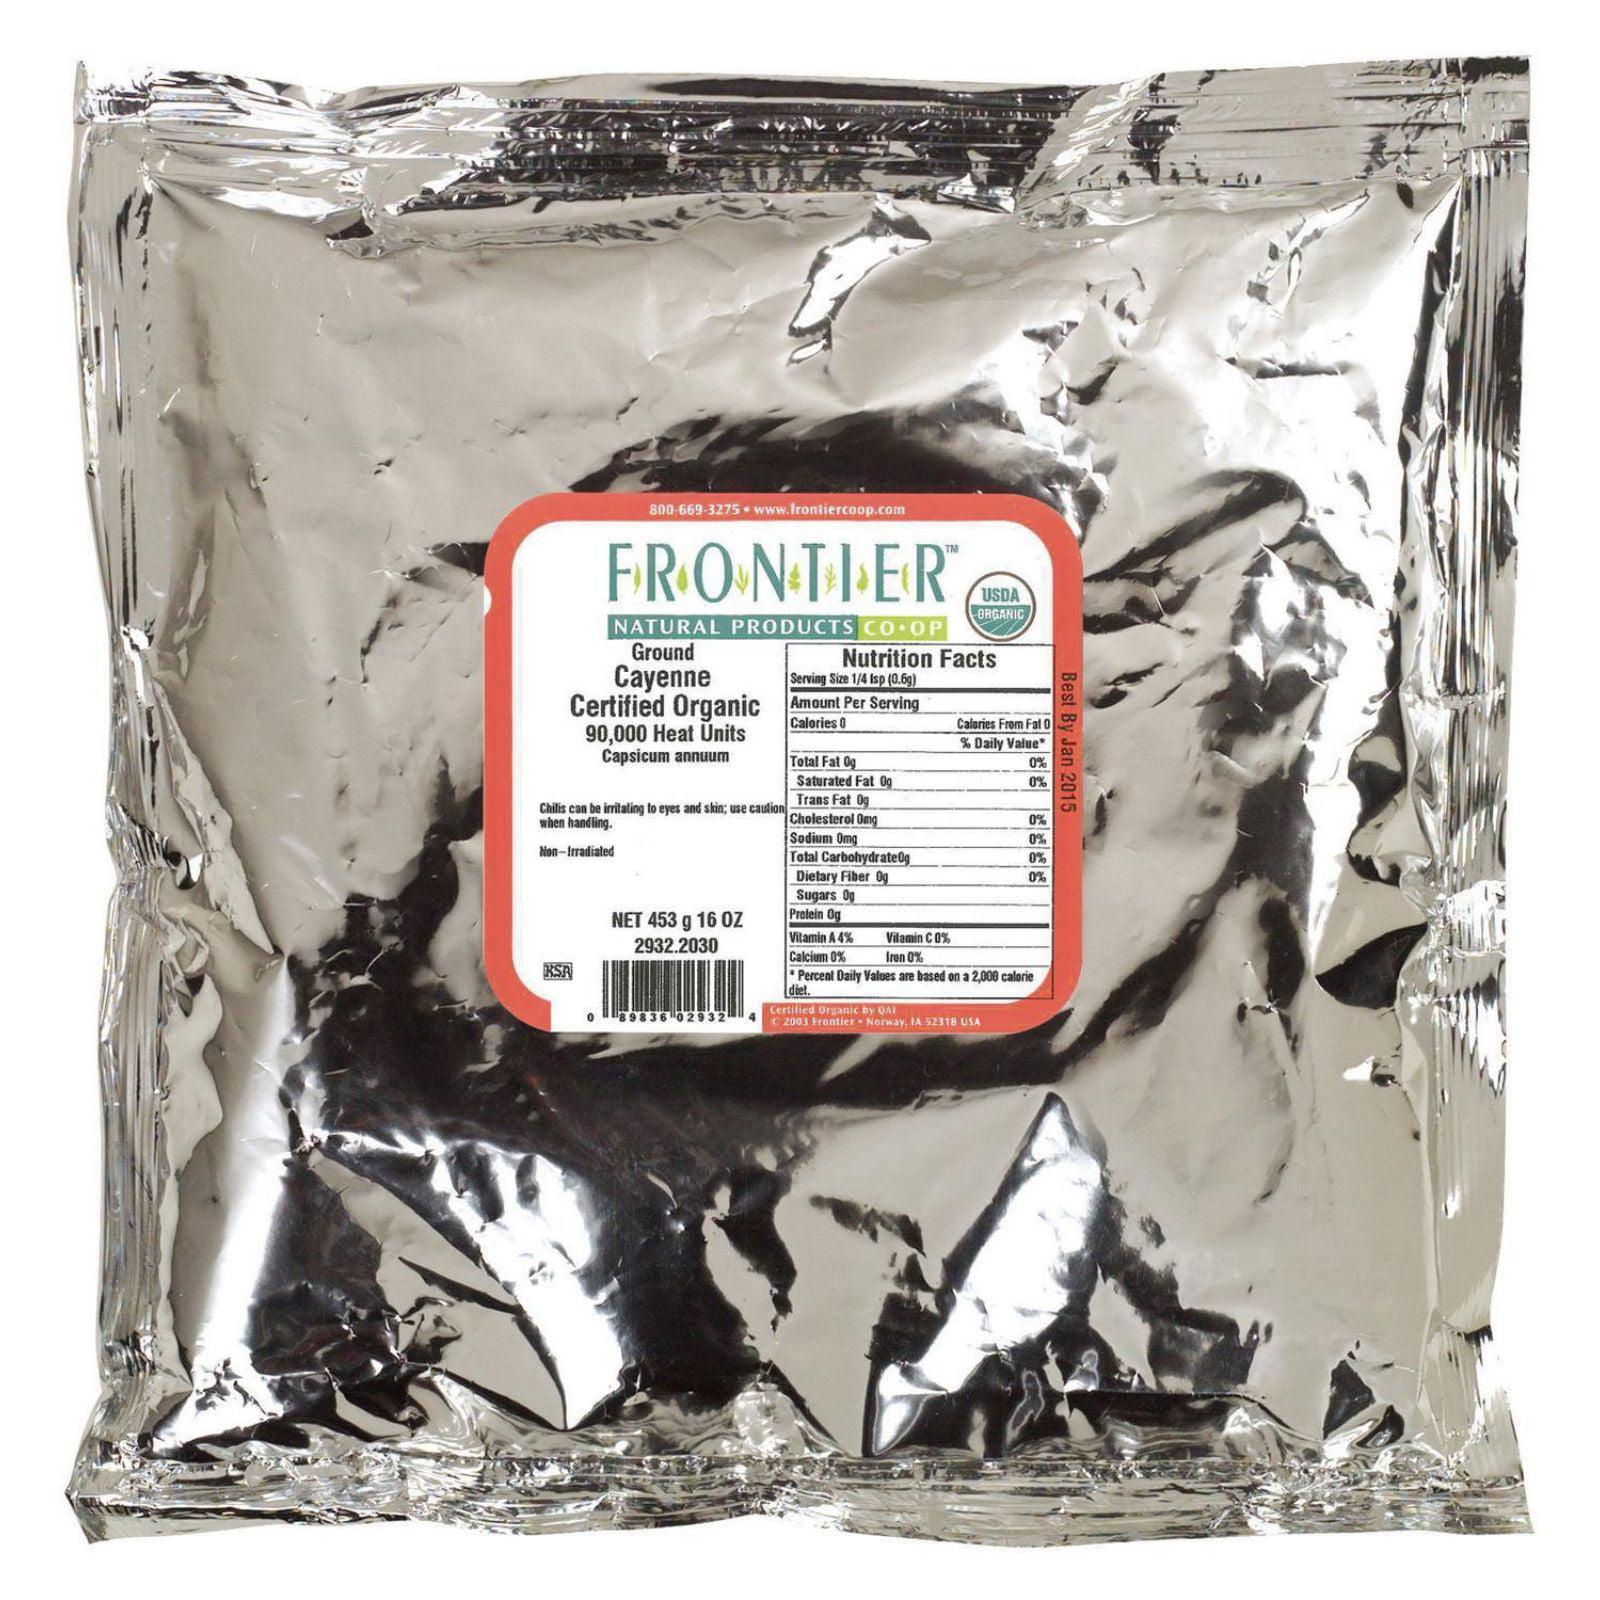 Frontier Herb Chili Pepper - Organic - Cayenne - Ground -...